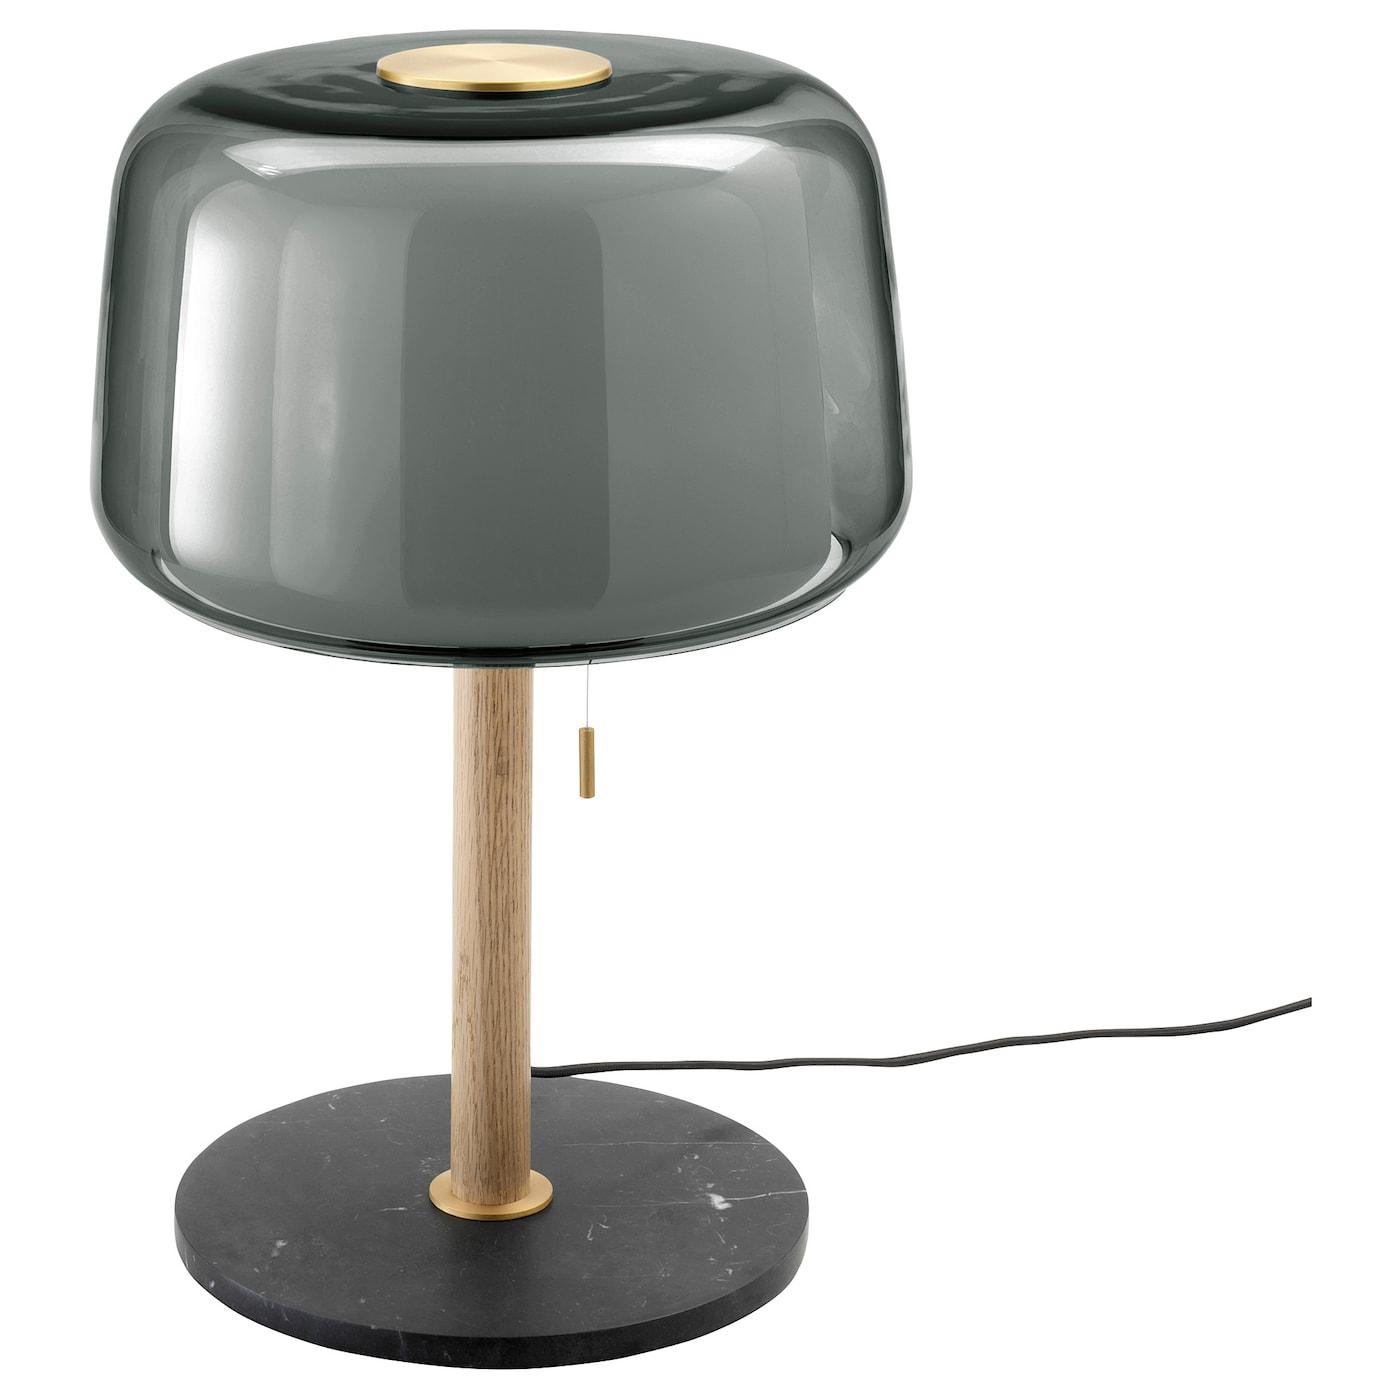 evedal lampe de table gris ikea. Black Bedroom Furniture Sets. Home Design Ideas